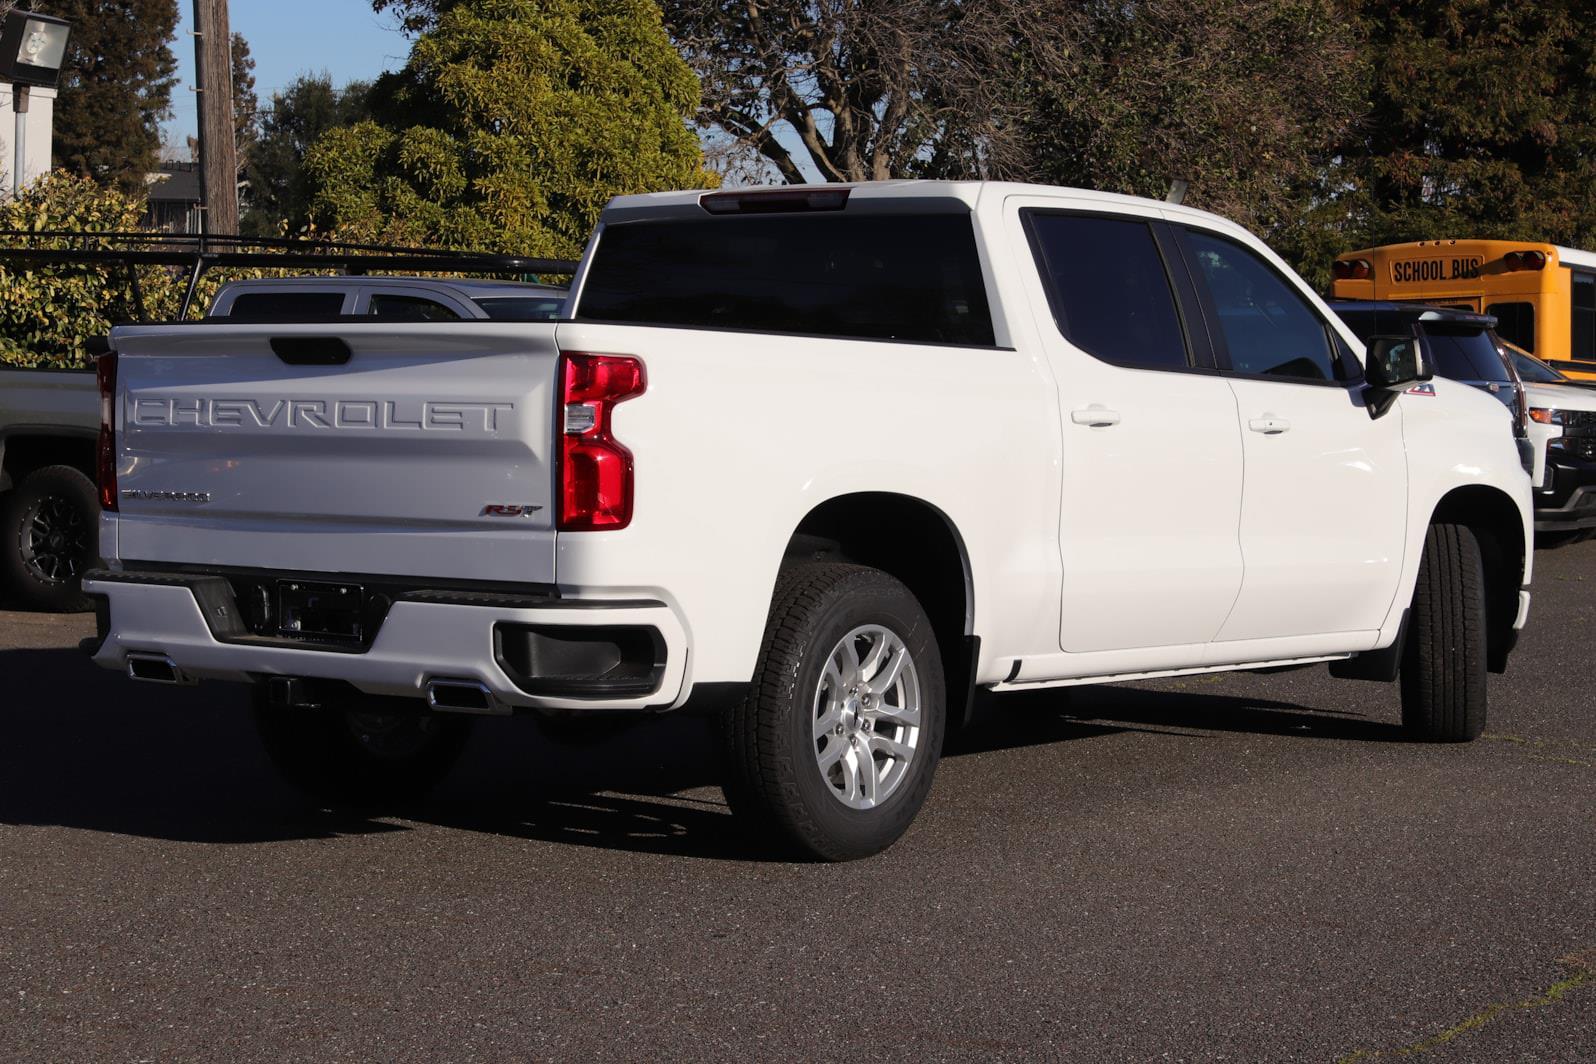 2021 Chevrolet Silverado 1500 Crew Cab 4x4, Pickup #C02490 - photo 1